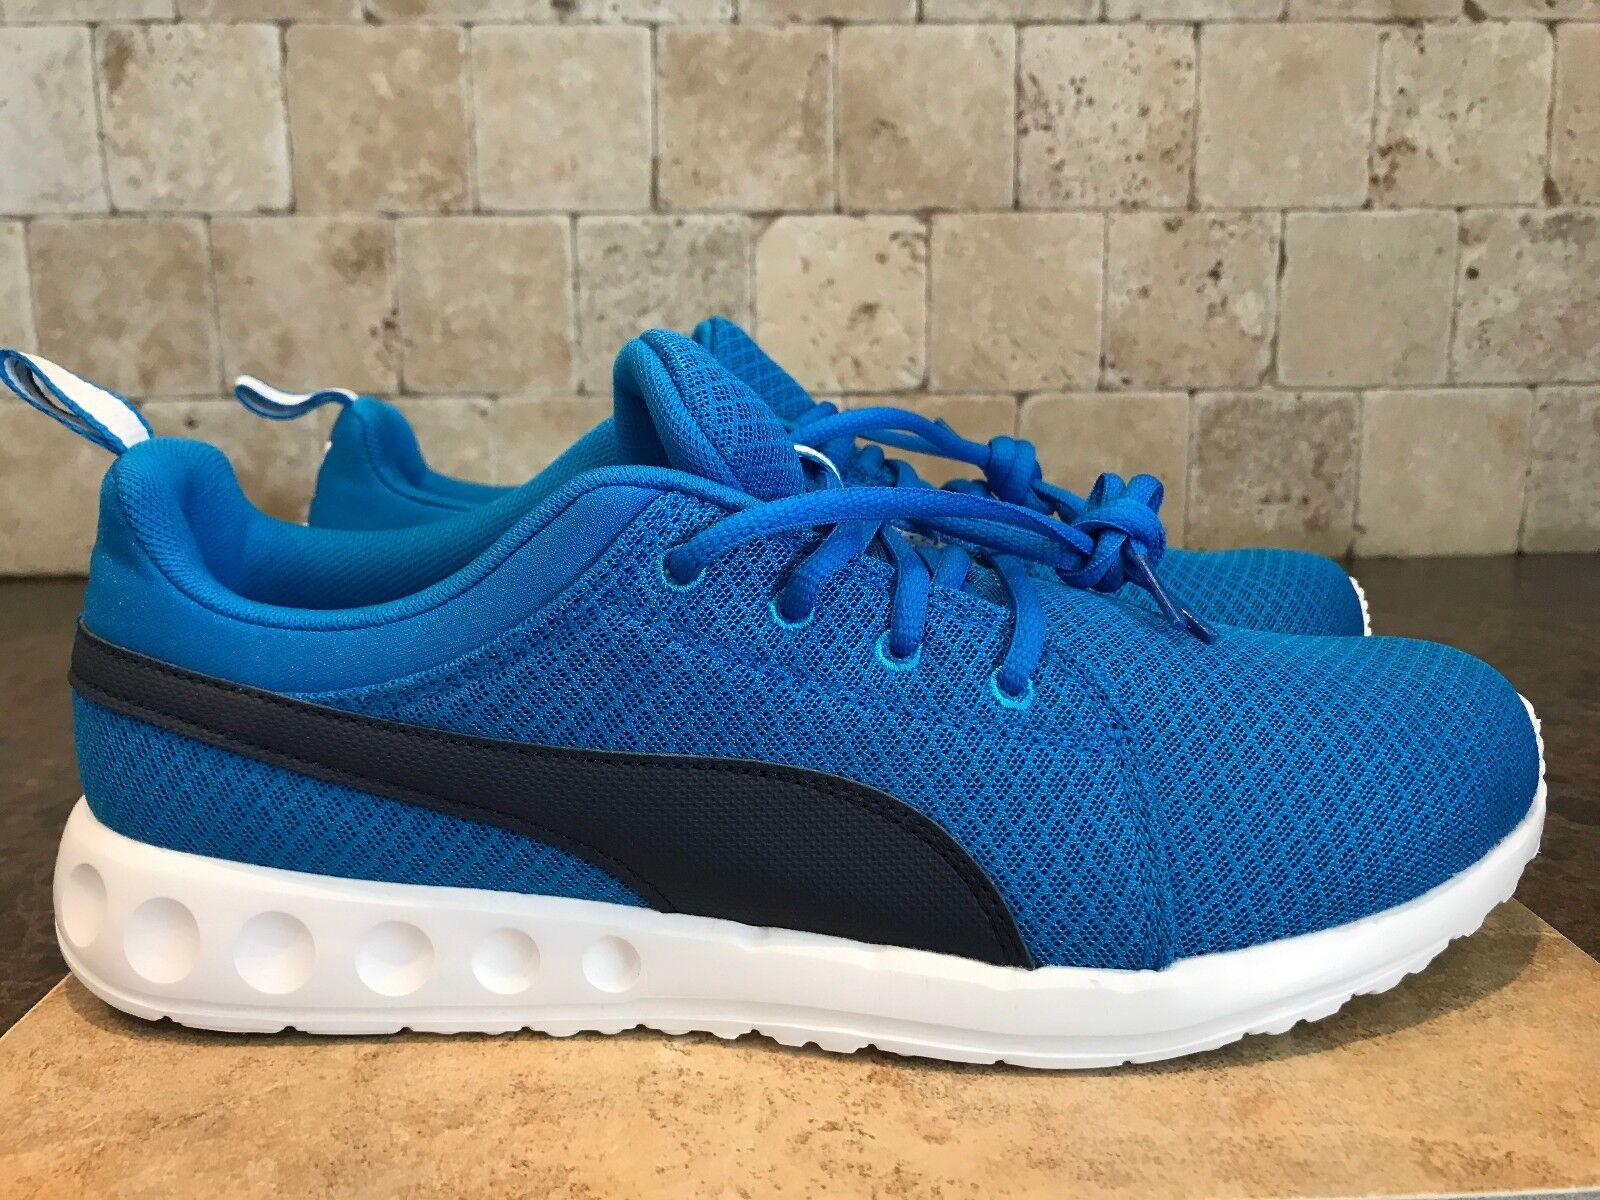 Hombre negro Puma Carson zapatos azul negro Hombre blanco nuevo cfa2b6